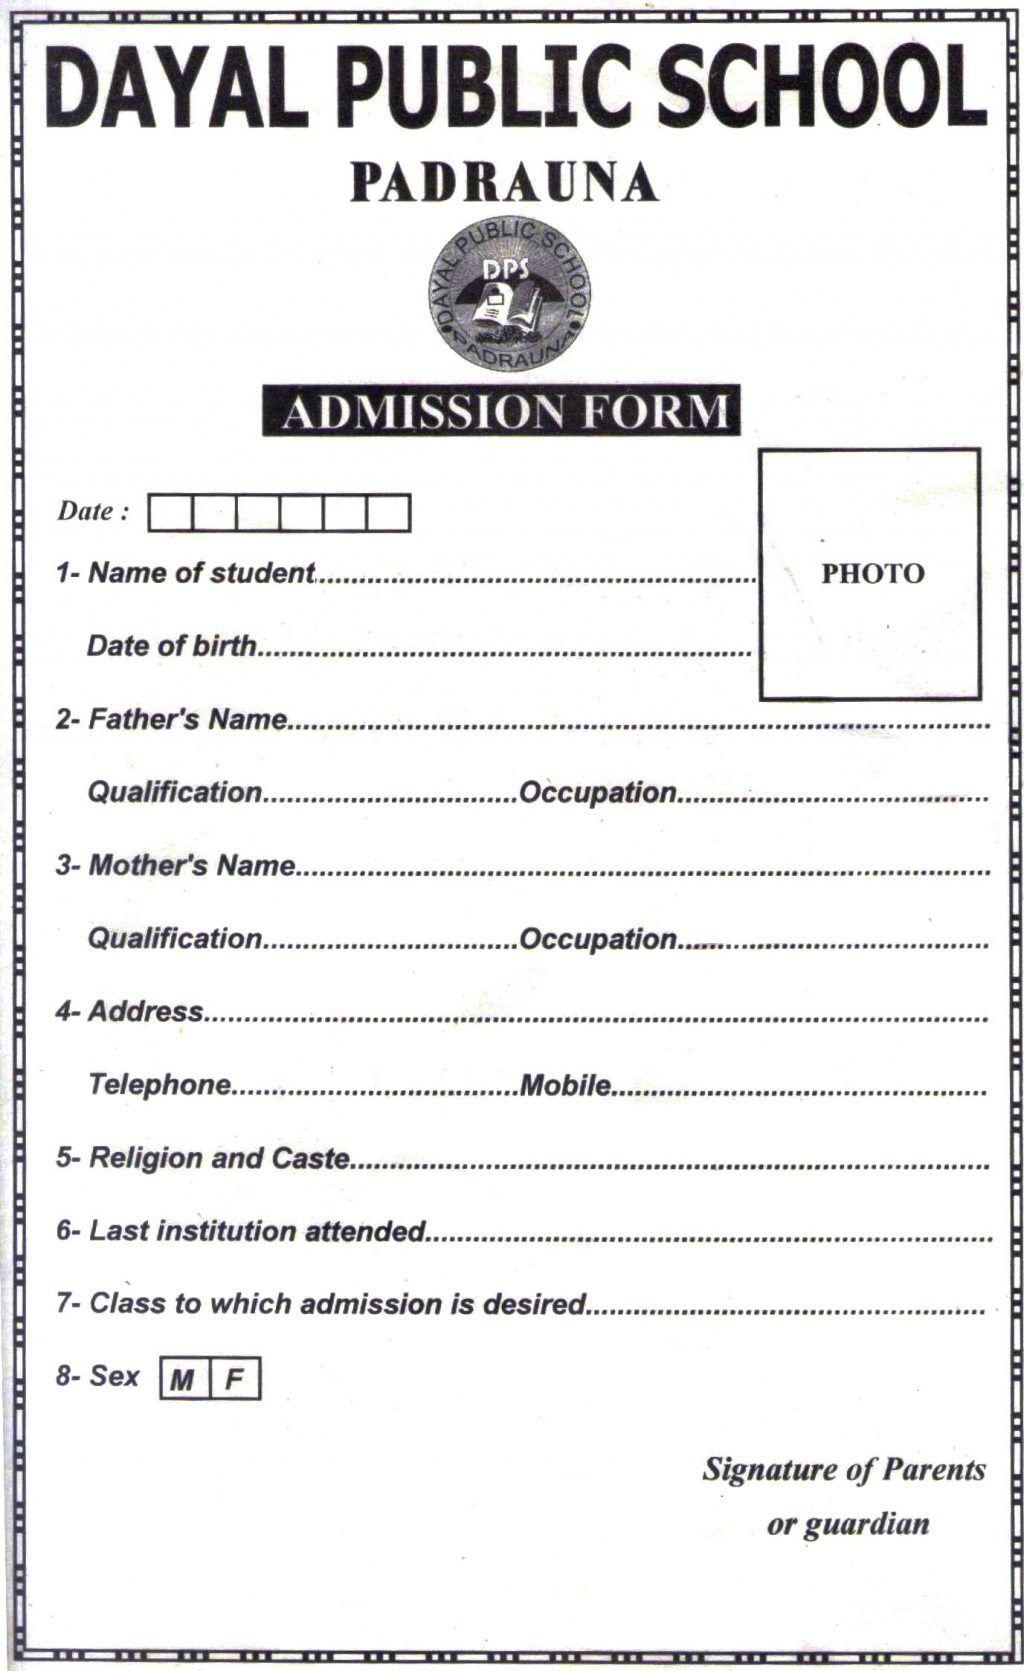 Admission Form School Termination Employee Letter Doc13772247 Dps School Mughals School Admission Form School Admissions Admissions [ 1671 x 1024 Pixel ]